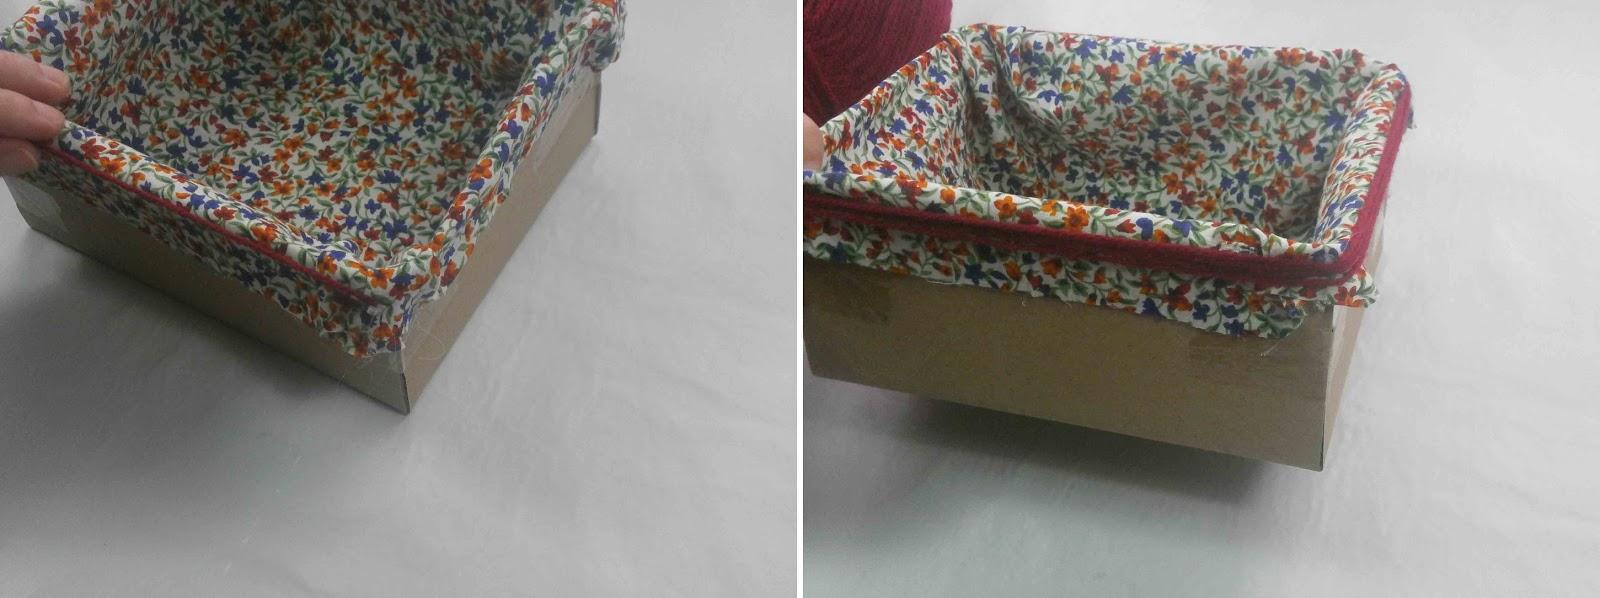 Cajas Decoradas Por Dentro Con Paja De Plastico